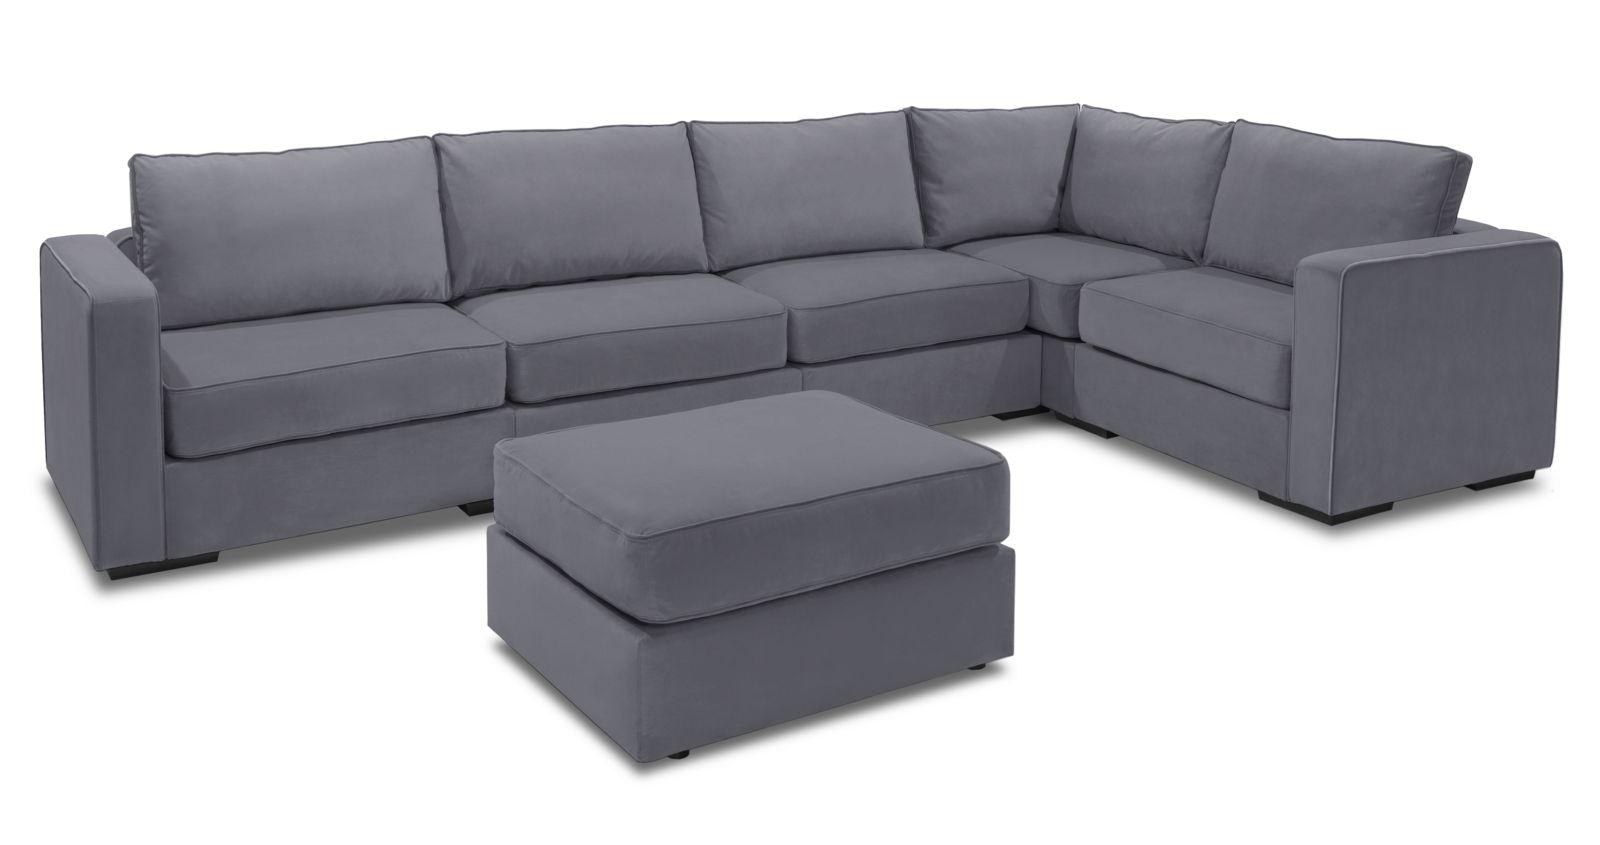 6 Seats 8 Sides